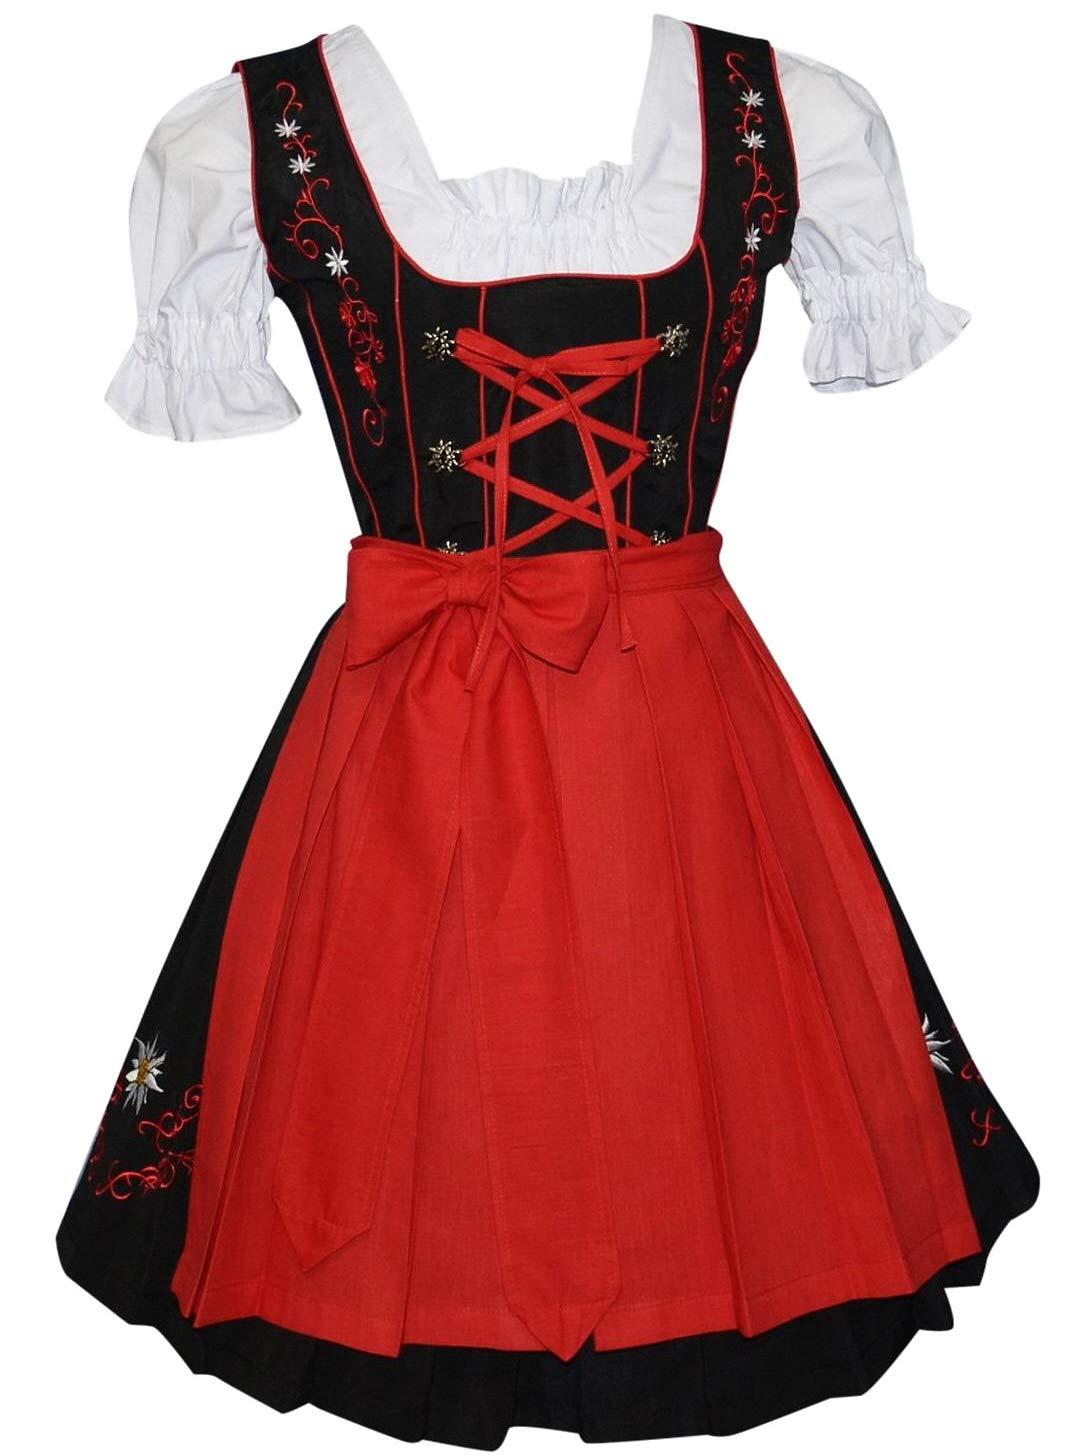 Edelweiss Creek 3-Piece Short German Party Oktoberfest Dirndl Dress Black & Red (14) by Edelweiss Creek